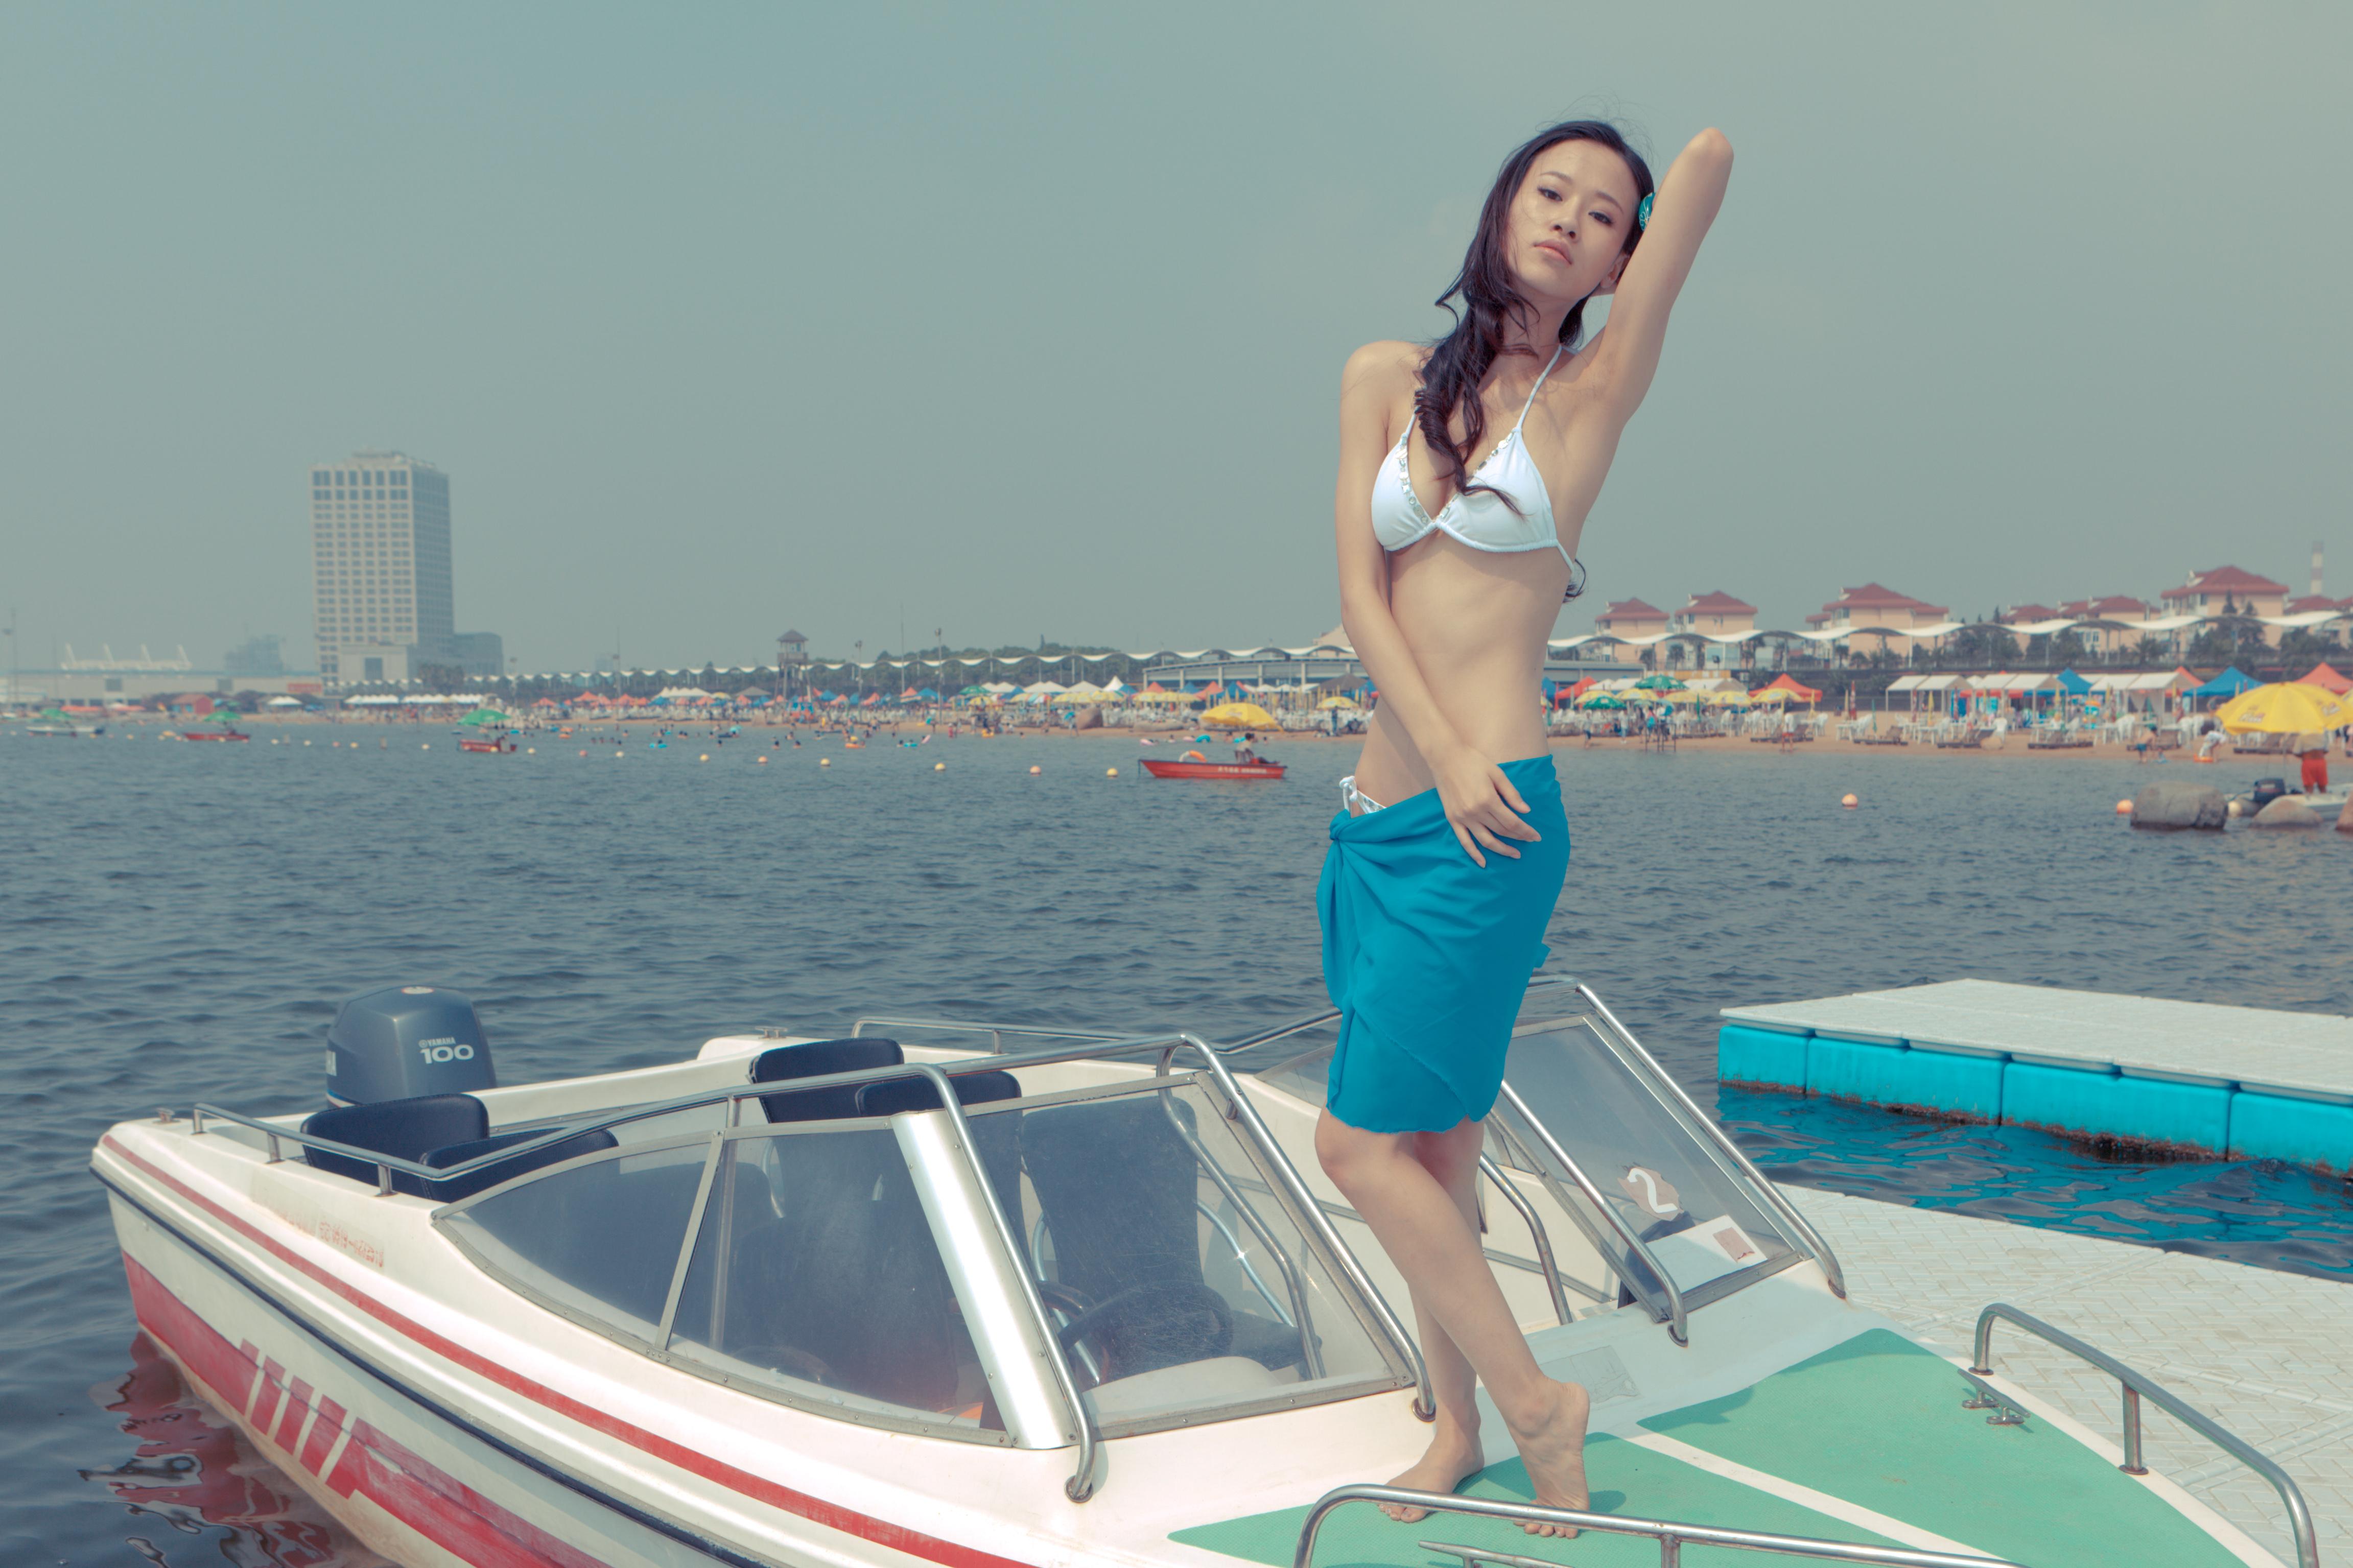 hot women nude on boats